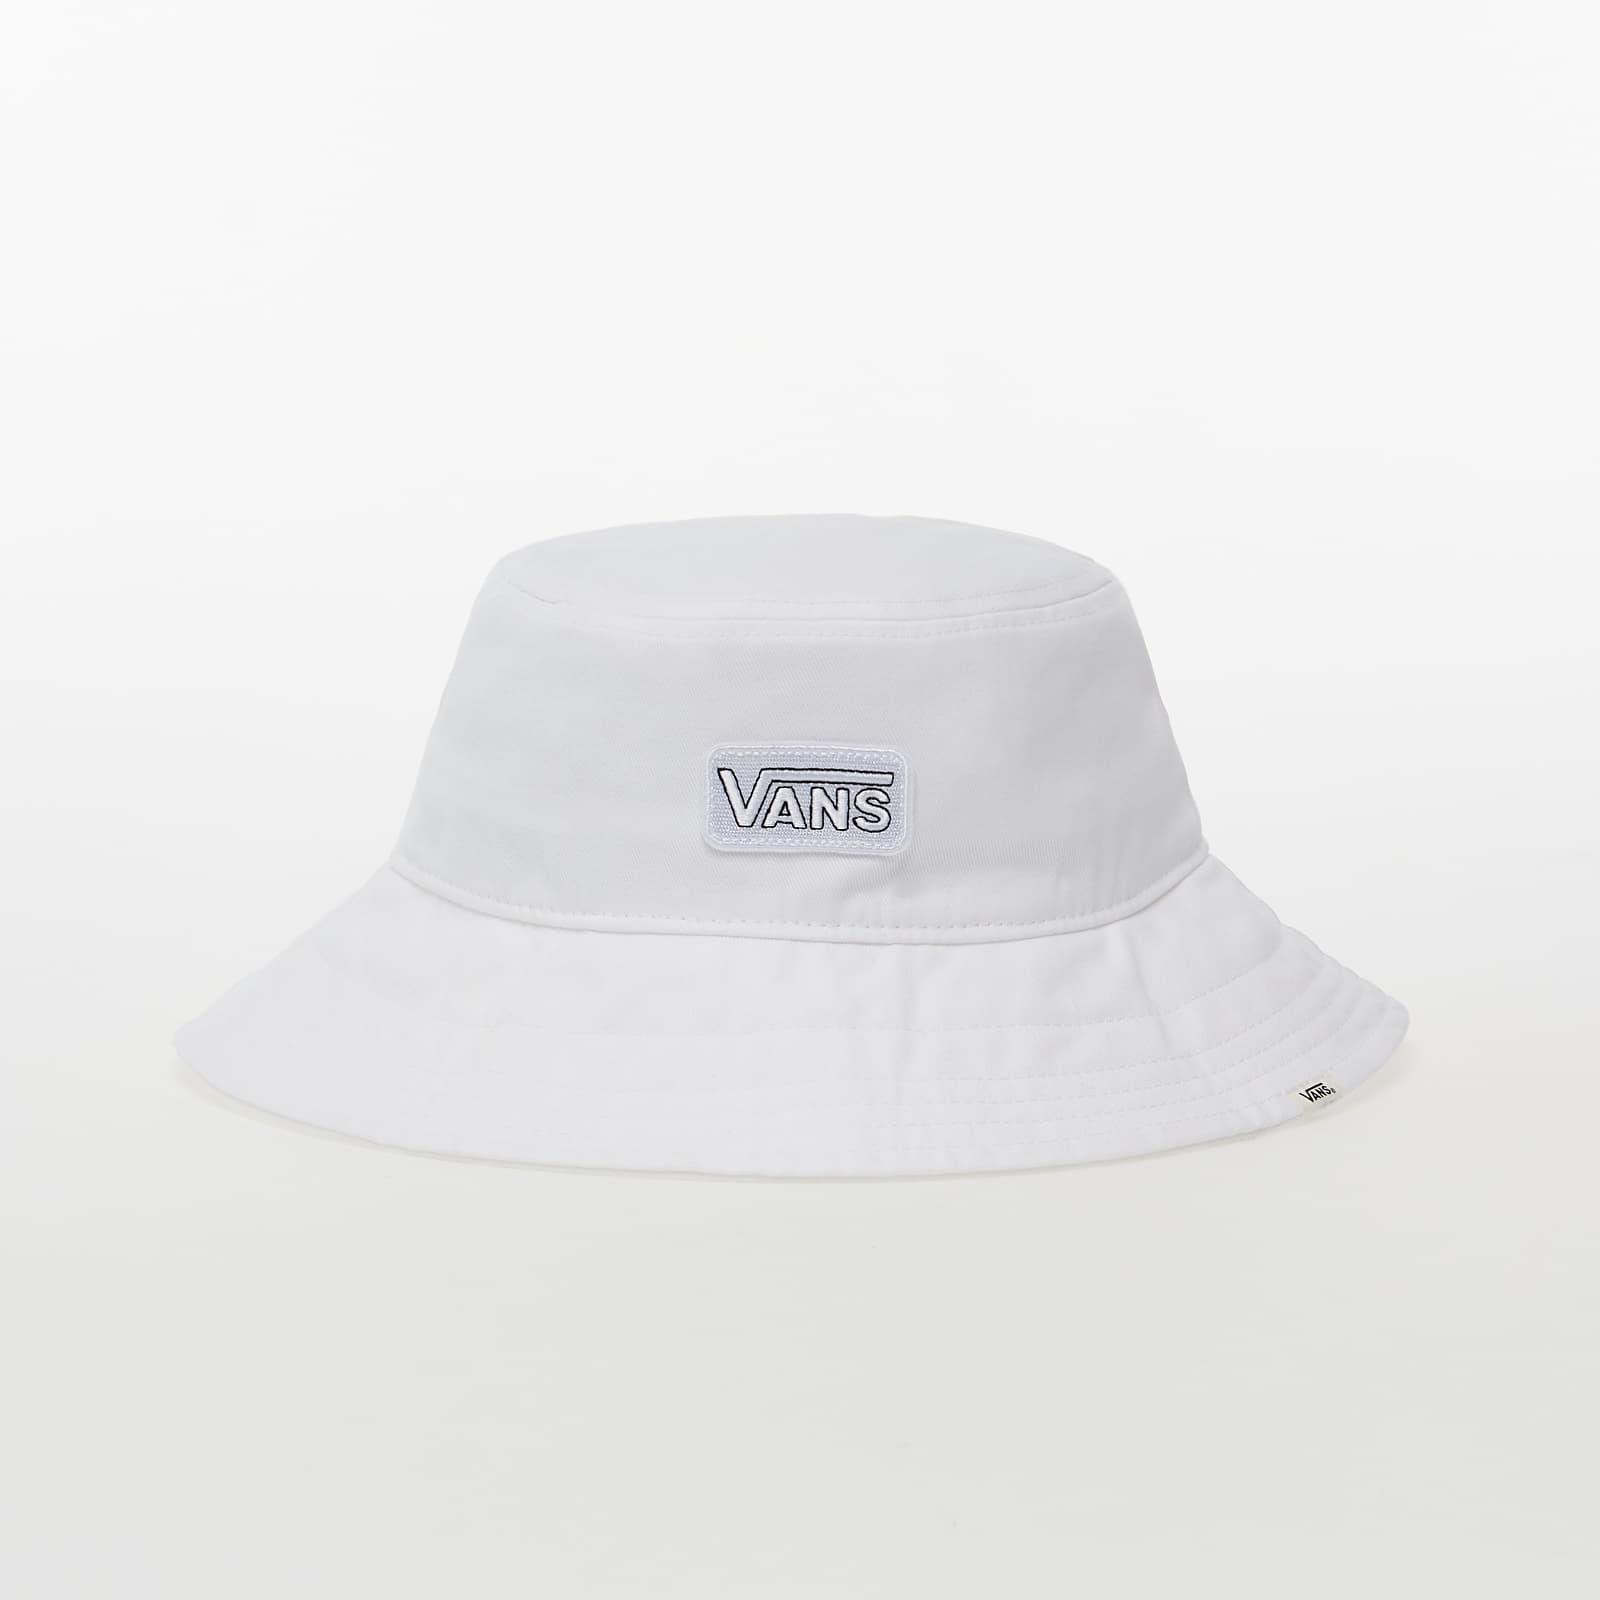 Klobúky Vans Diy Bucket Hat White